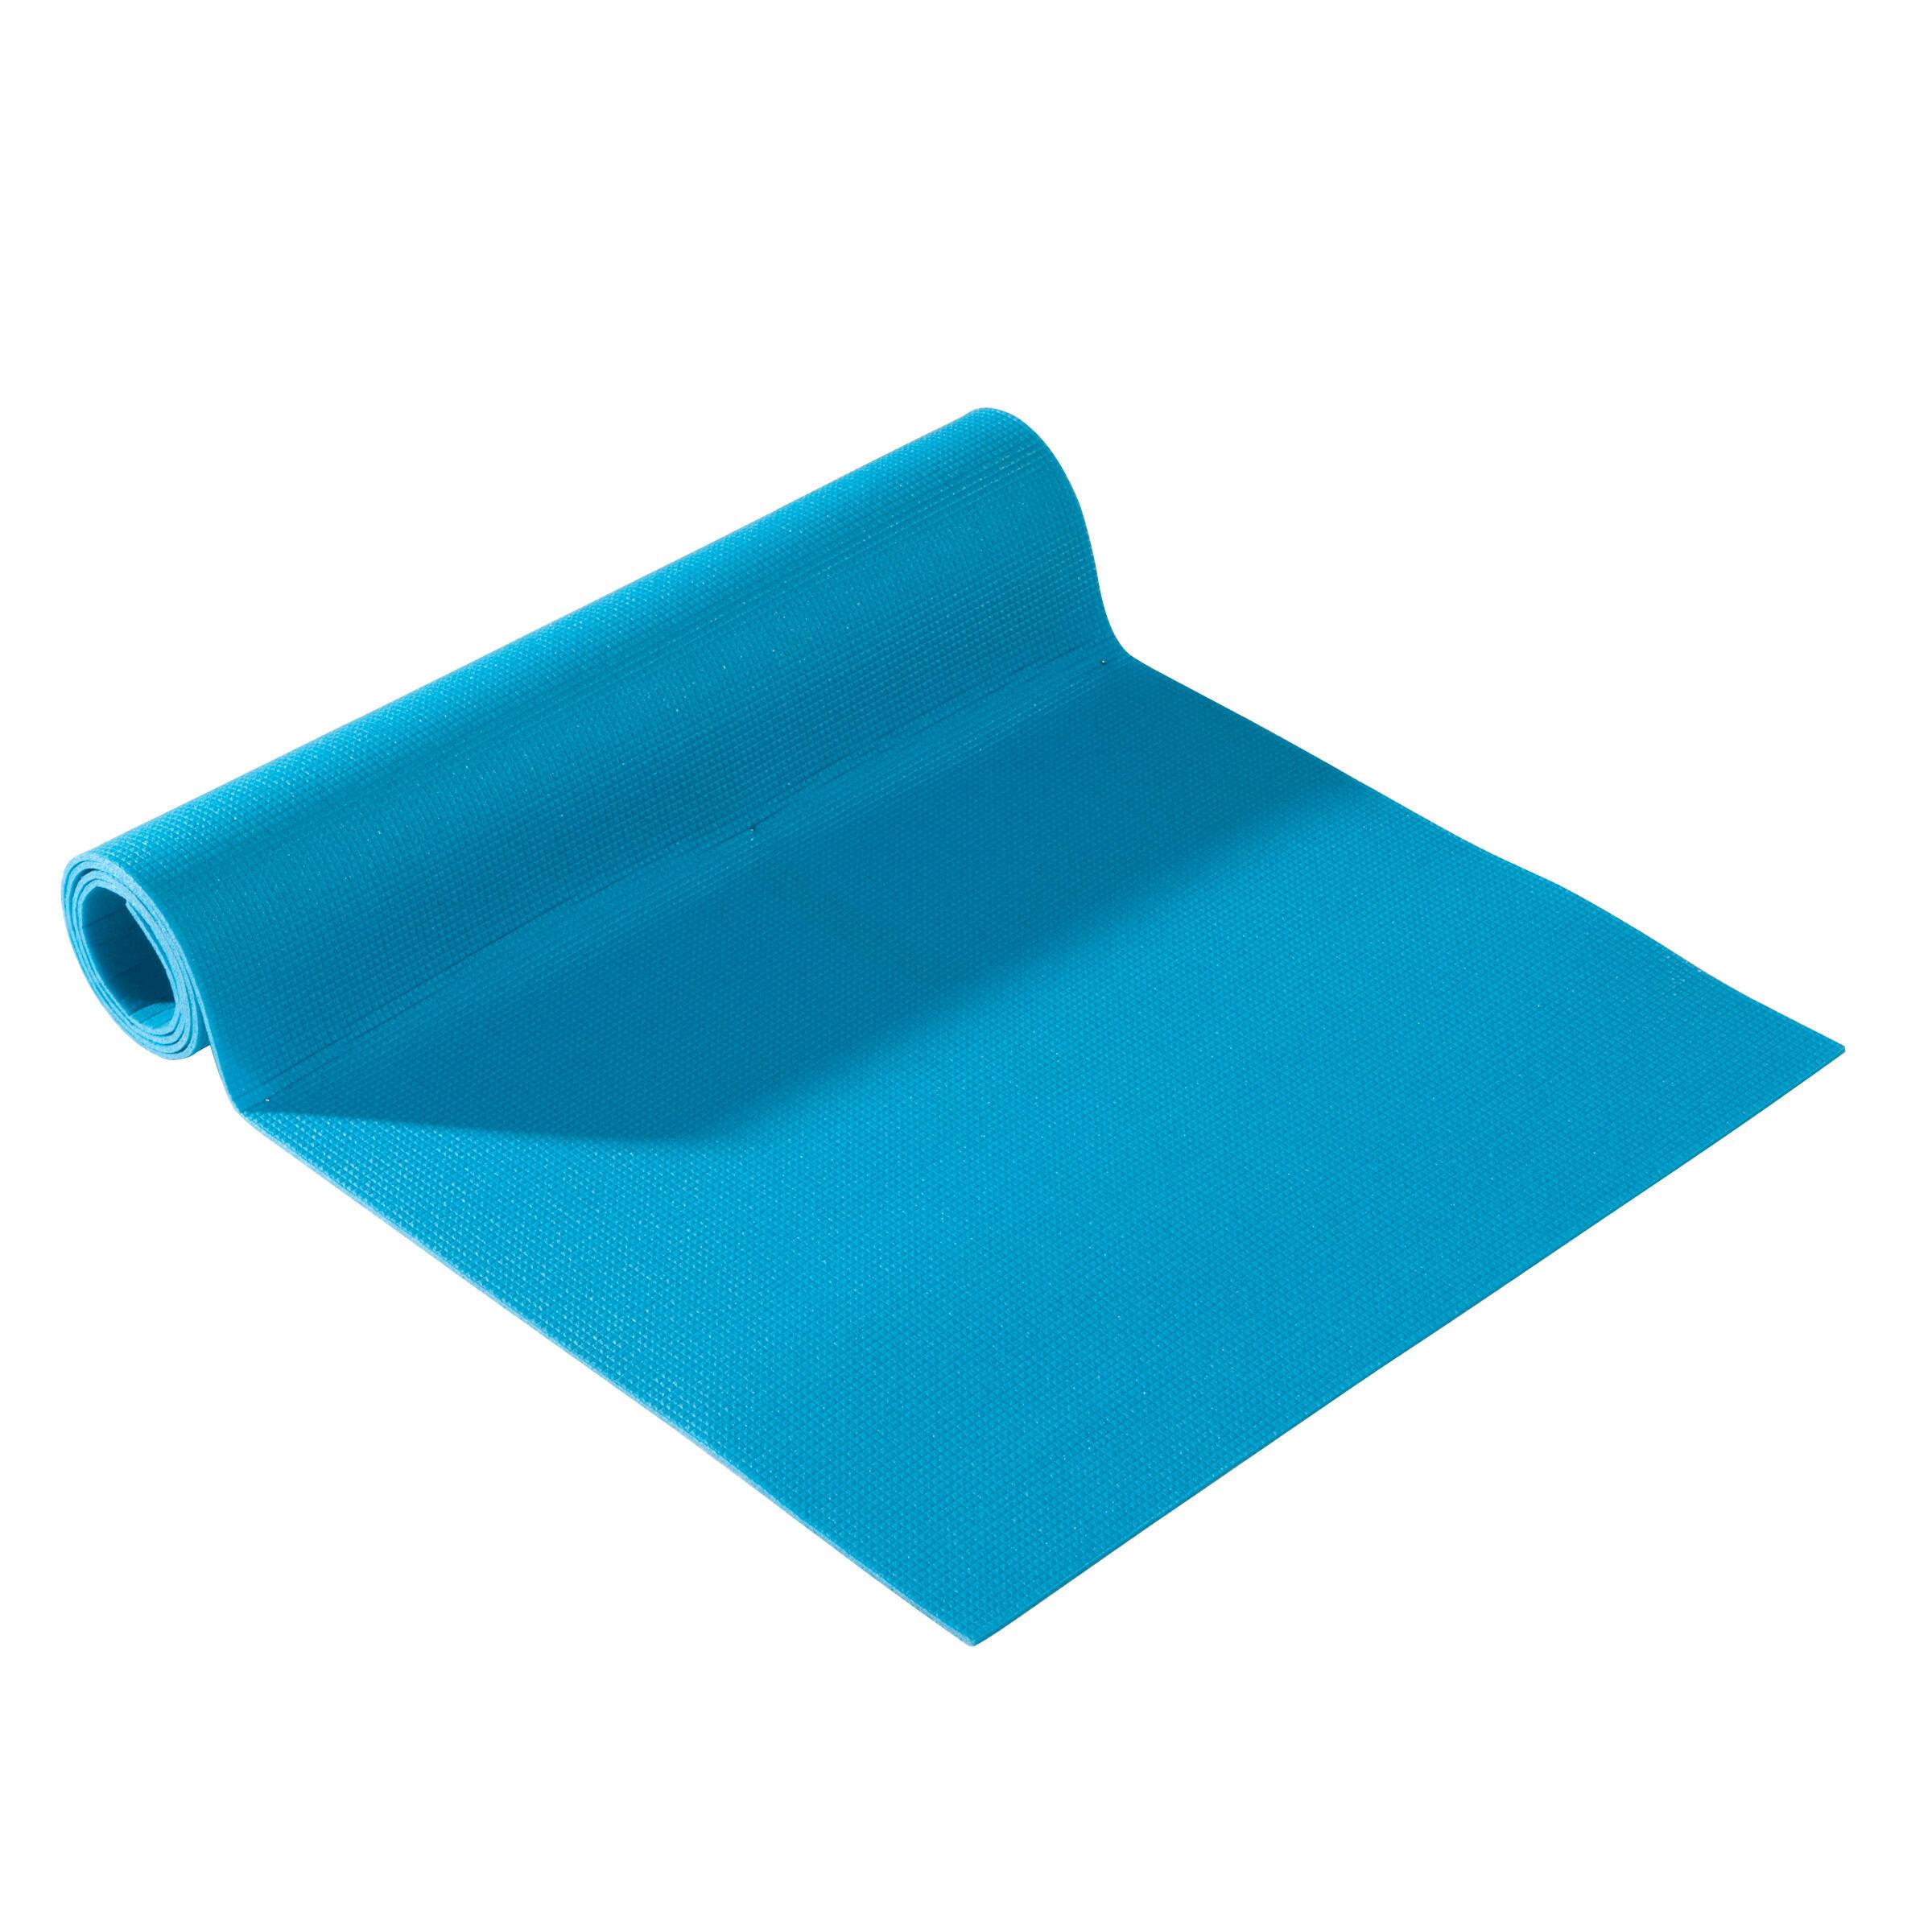 TAPETE DE YOGA SUAVE ESENCIAL 4 mm azul